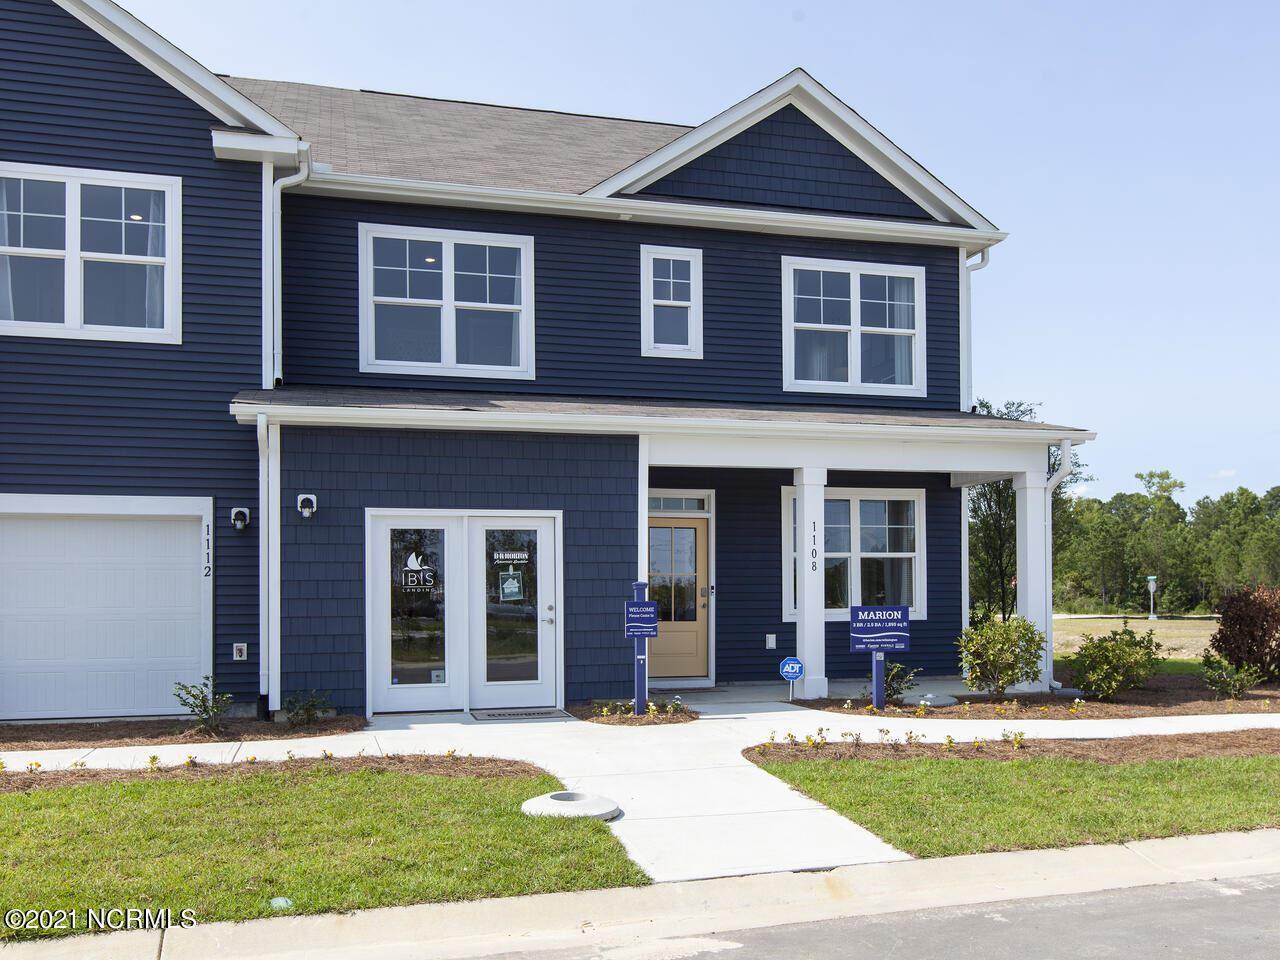 Photo of 4620 Wildaire Lane #Lot 14, Leland, NC 28451 (MLS # 100287974)